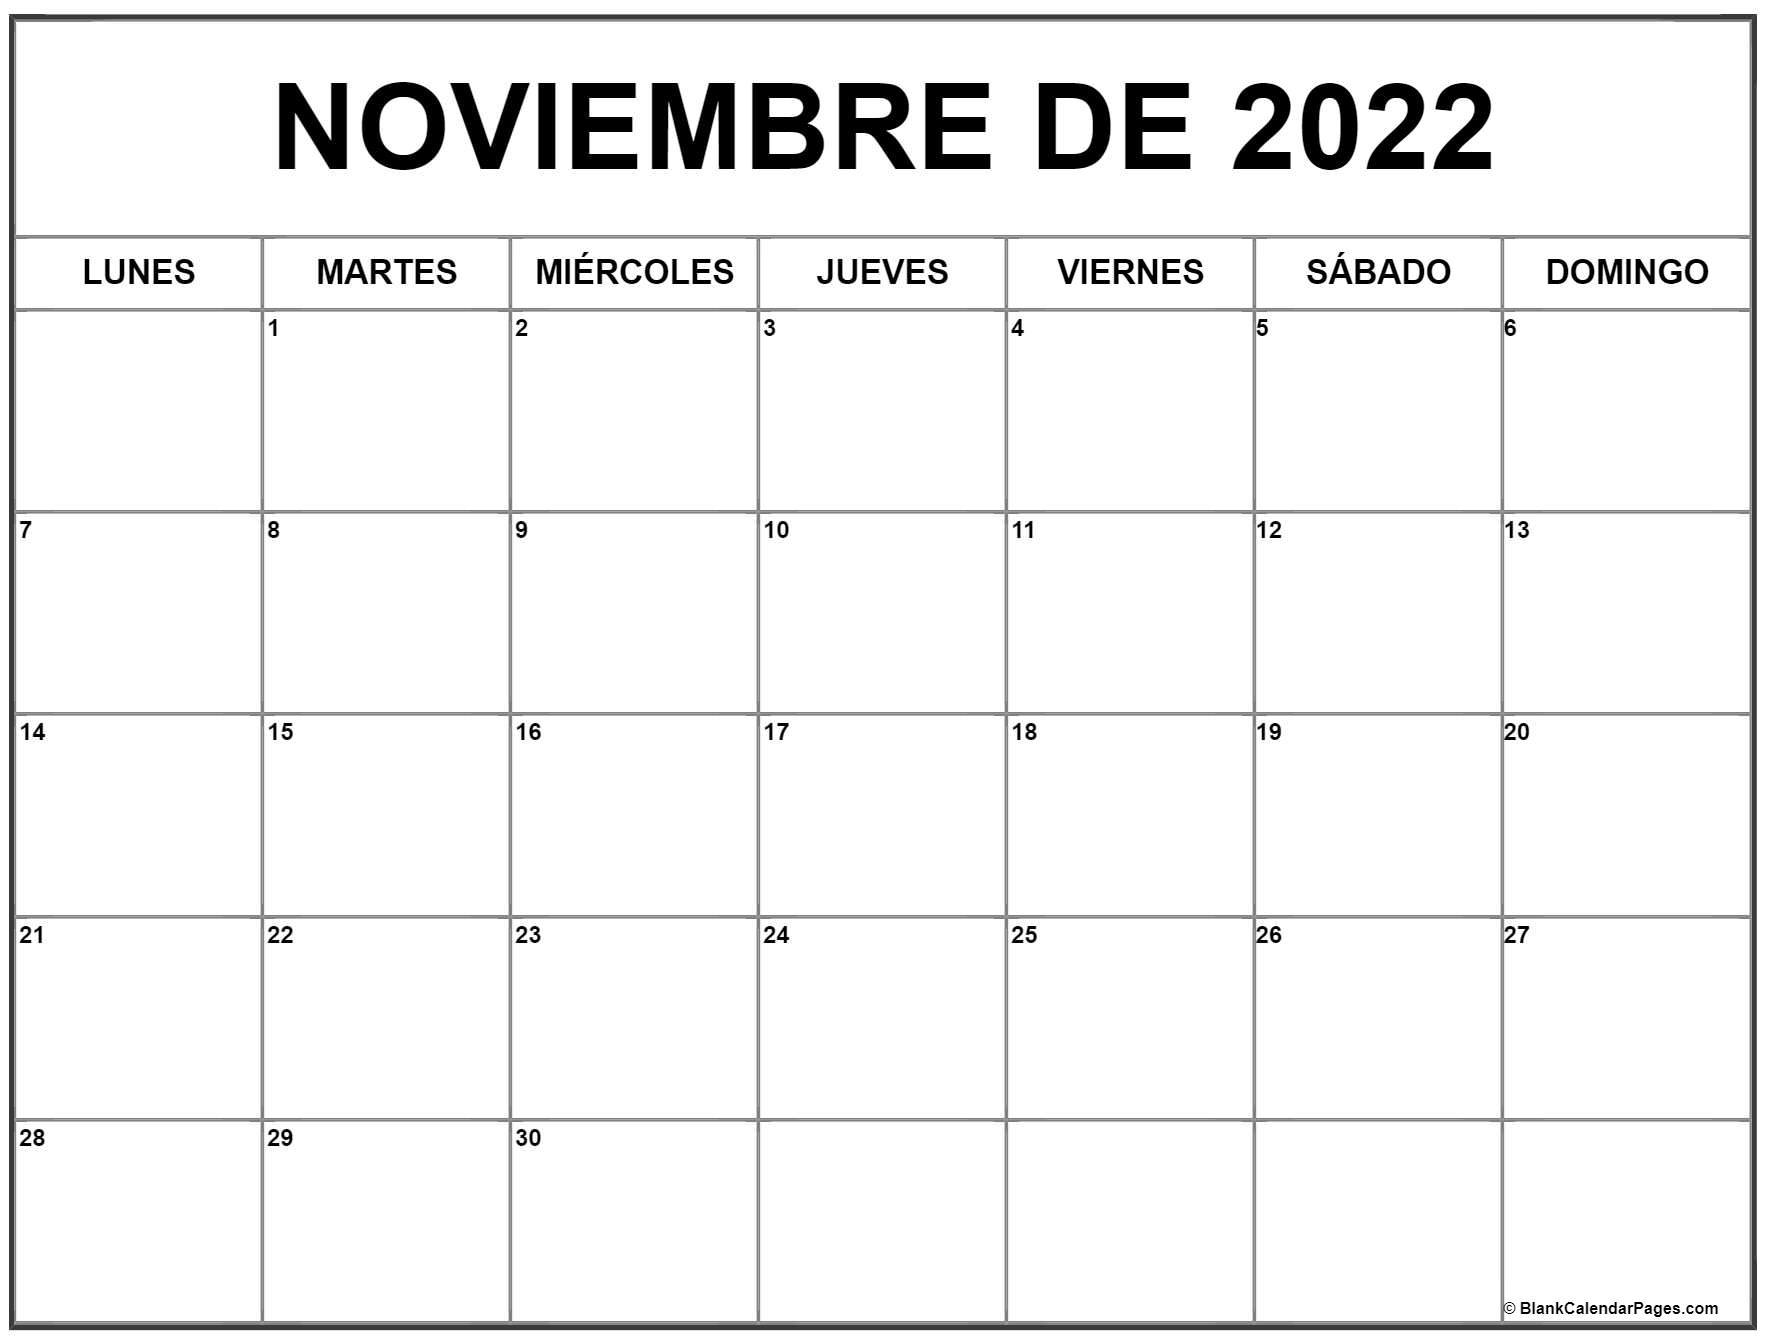 noviembre de 2022 calendrario